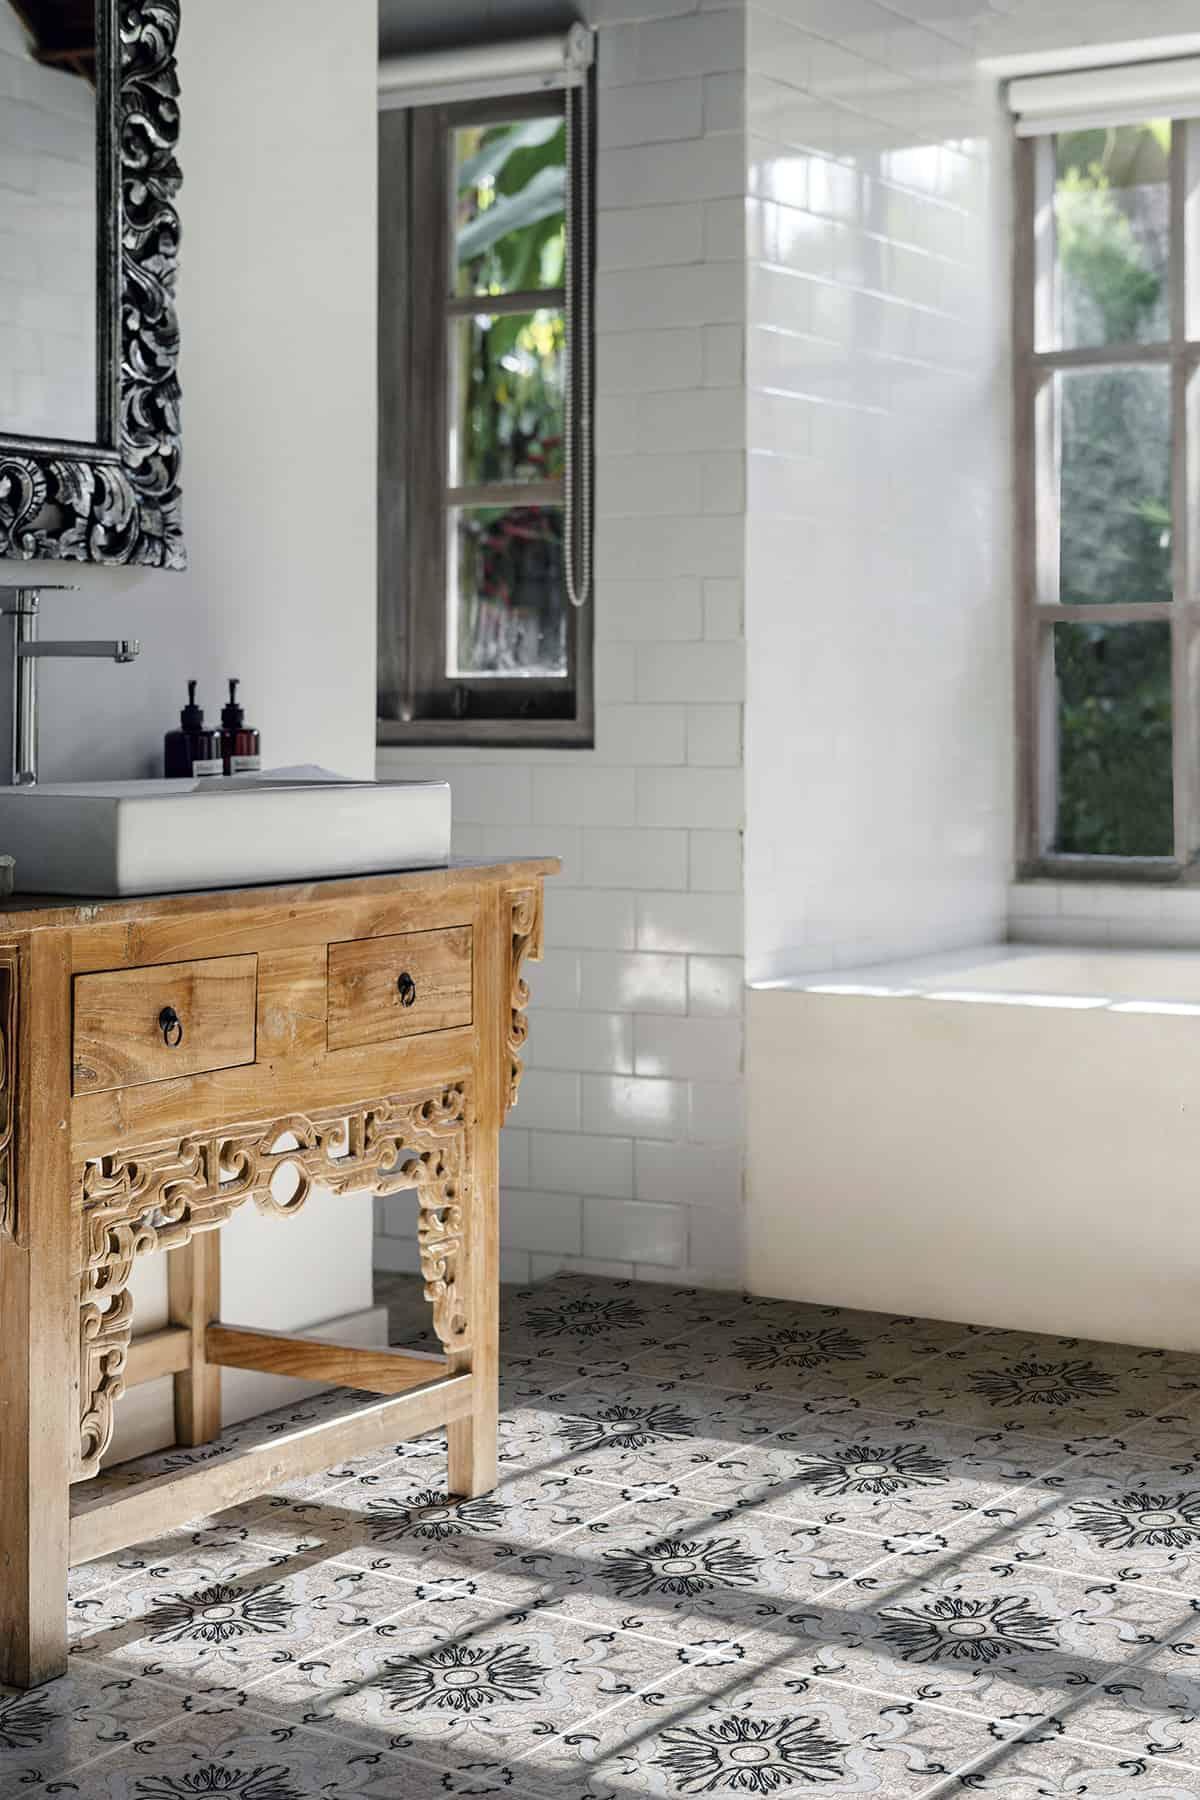 Dulcet (Black) Perle Blanc Bathroom Floor